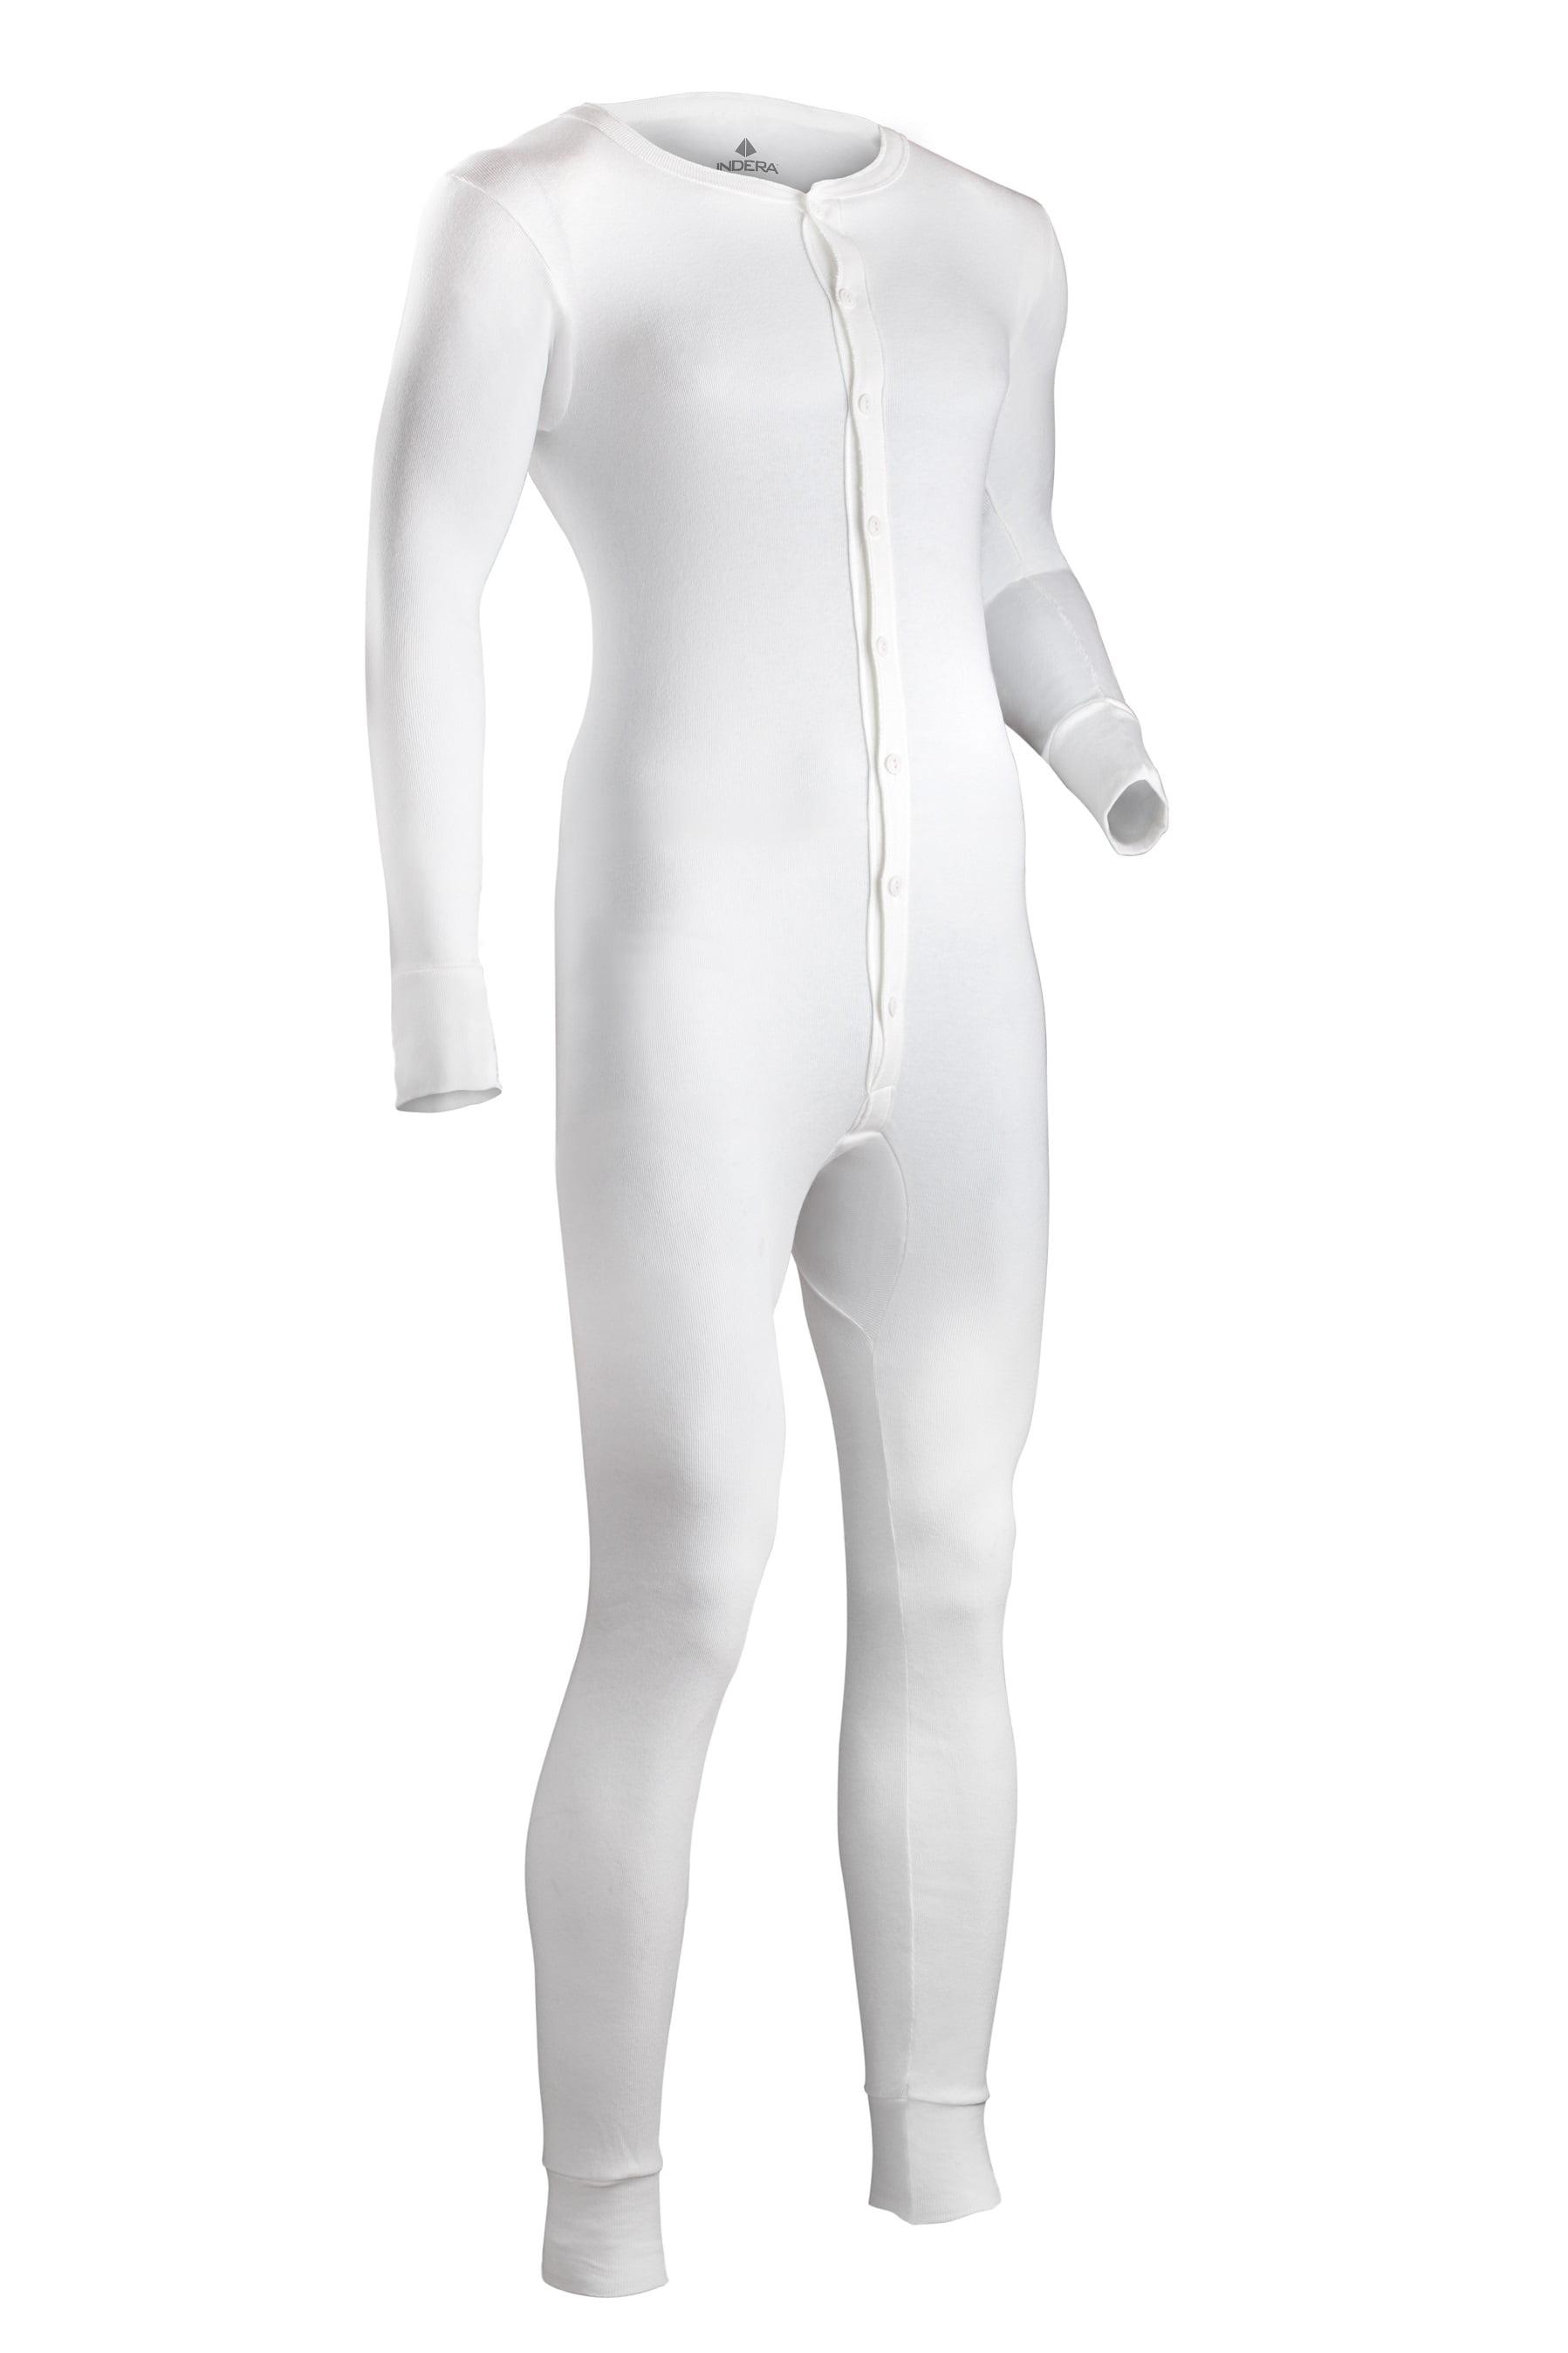 Indera Mens Cotton 1 x 1 Rib Union Suit